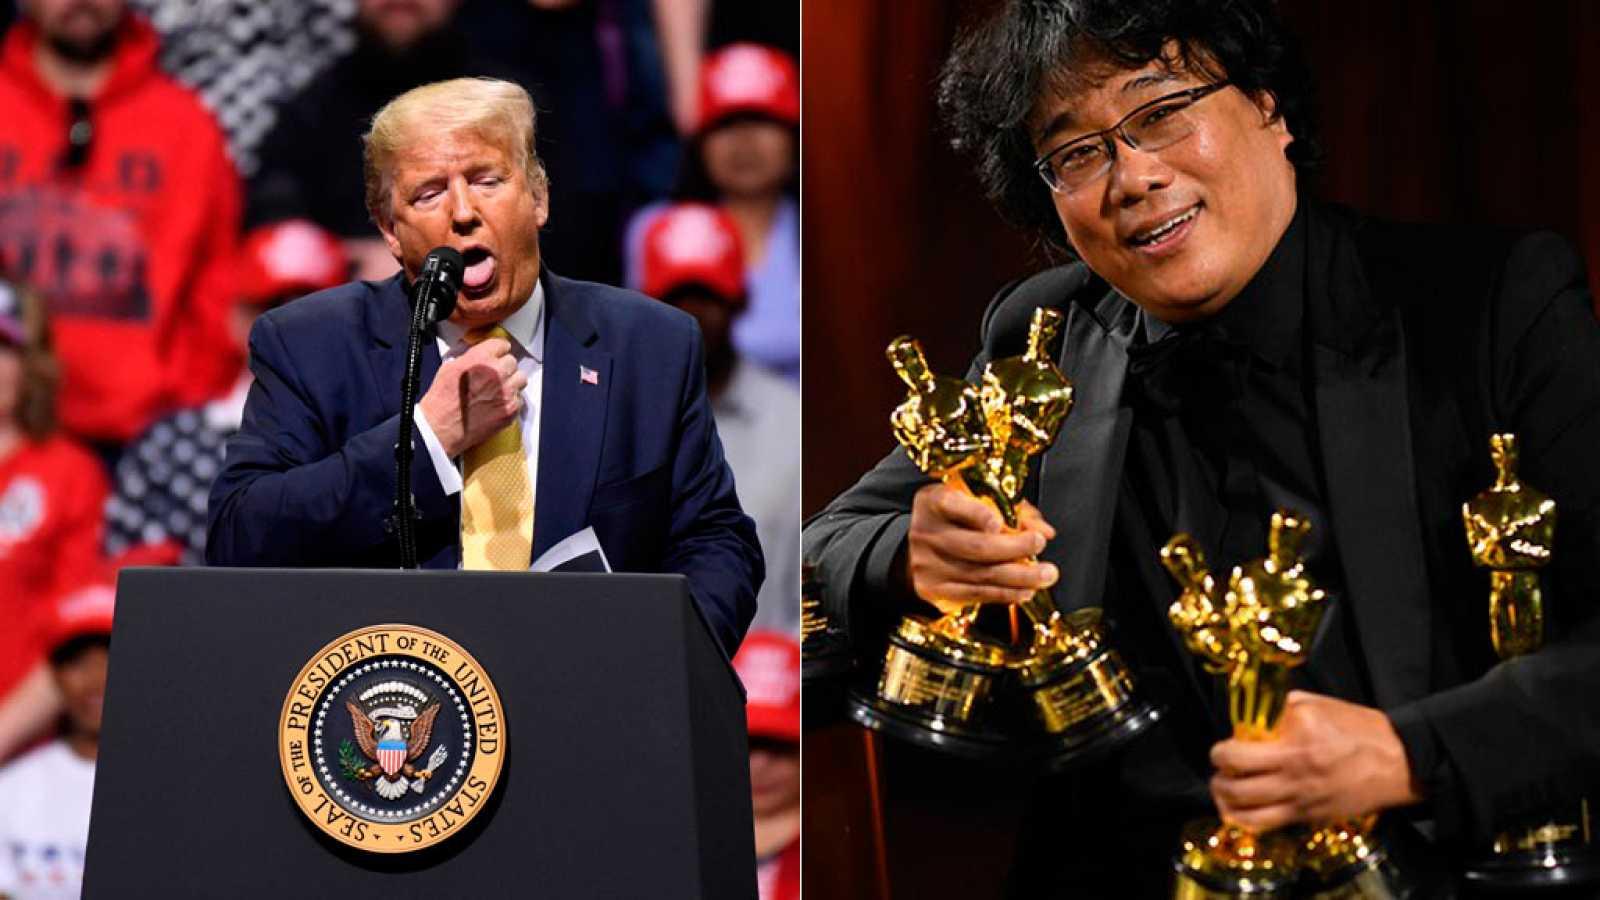 Donald Trump critica a la Academia de Cine por premiar a la película coreana 'Parásitos'